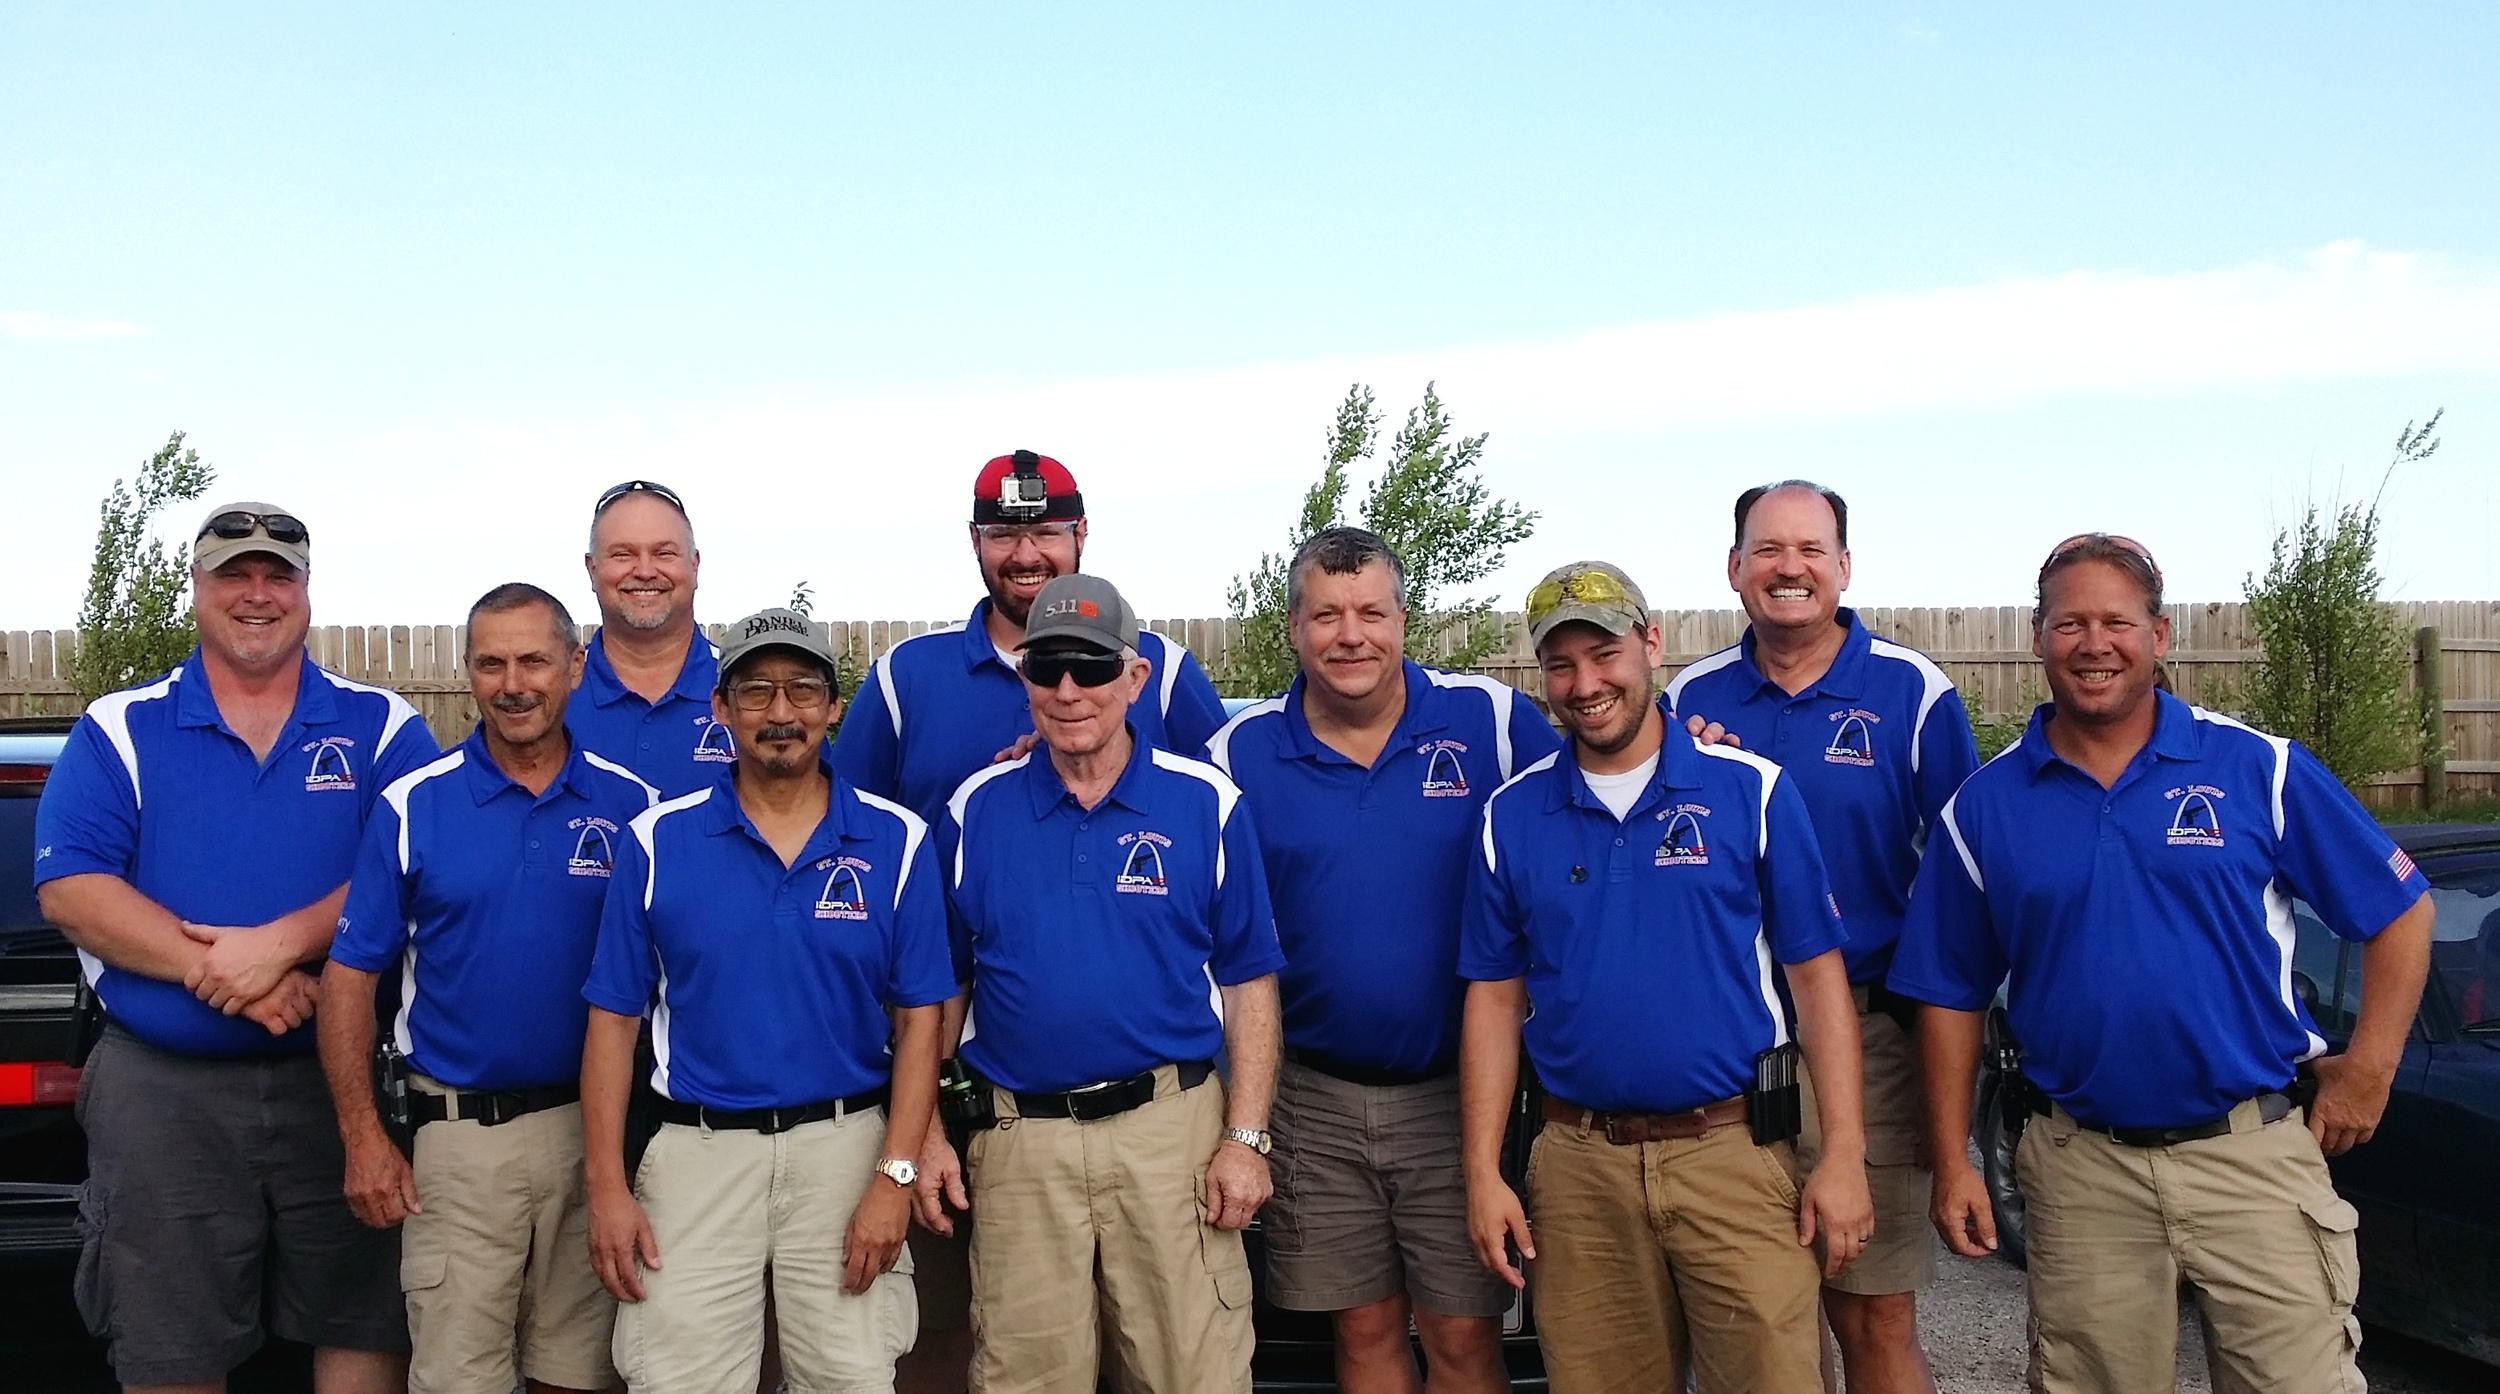 ARPC IDPA at Iowa State Championship: Joe S, Jerry G, Don F, George S, Tim O, Harold C, Jere W, Brandon W, Jerry A, Glen L.